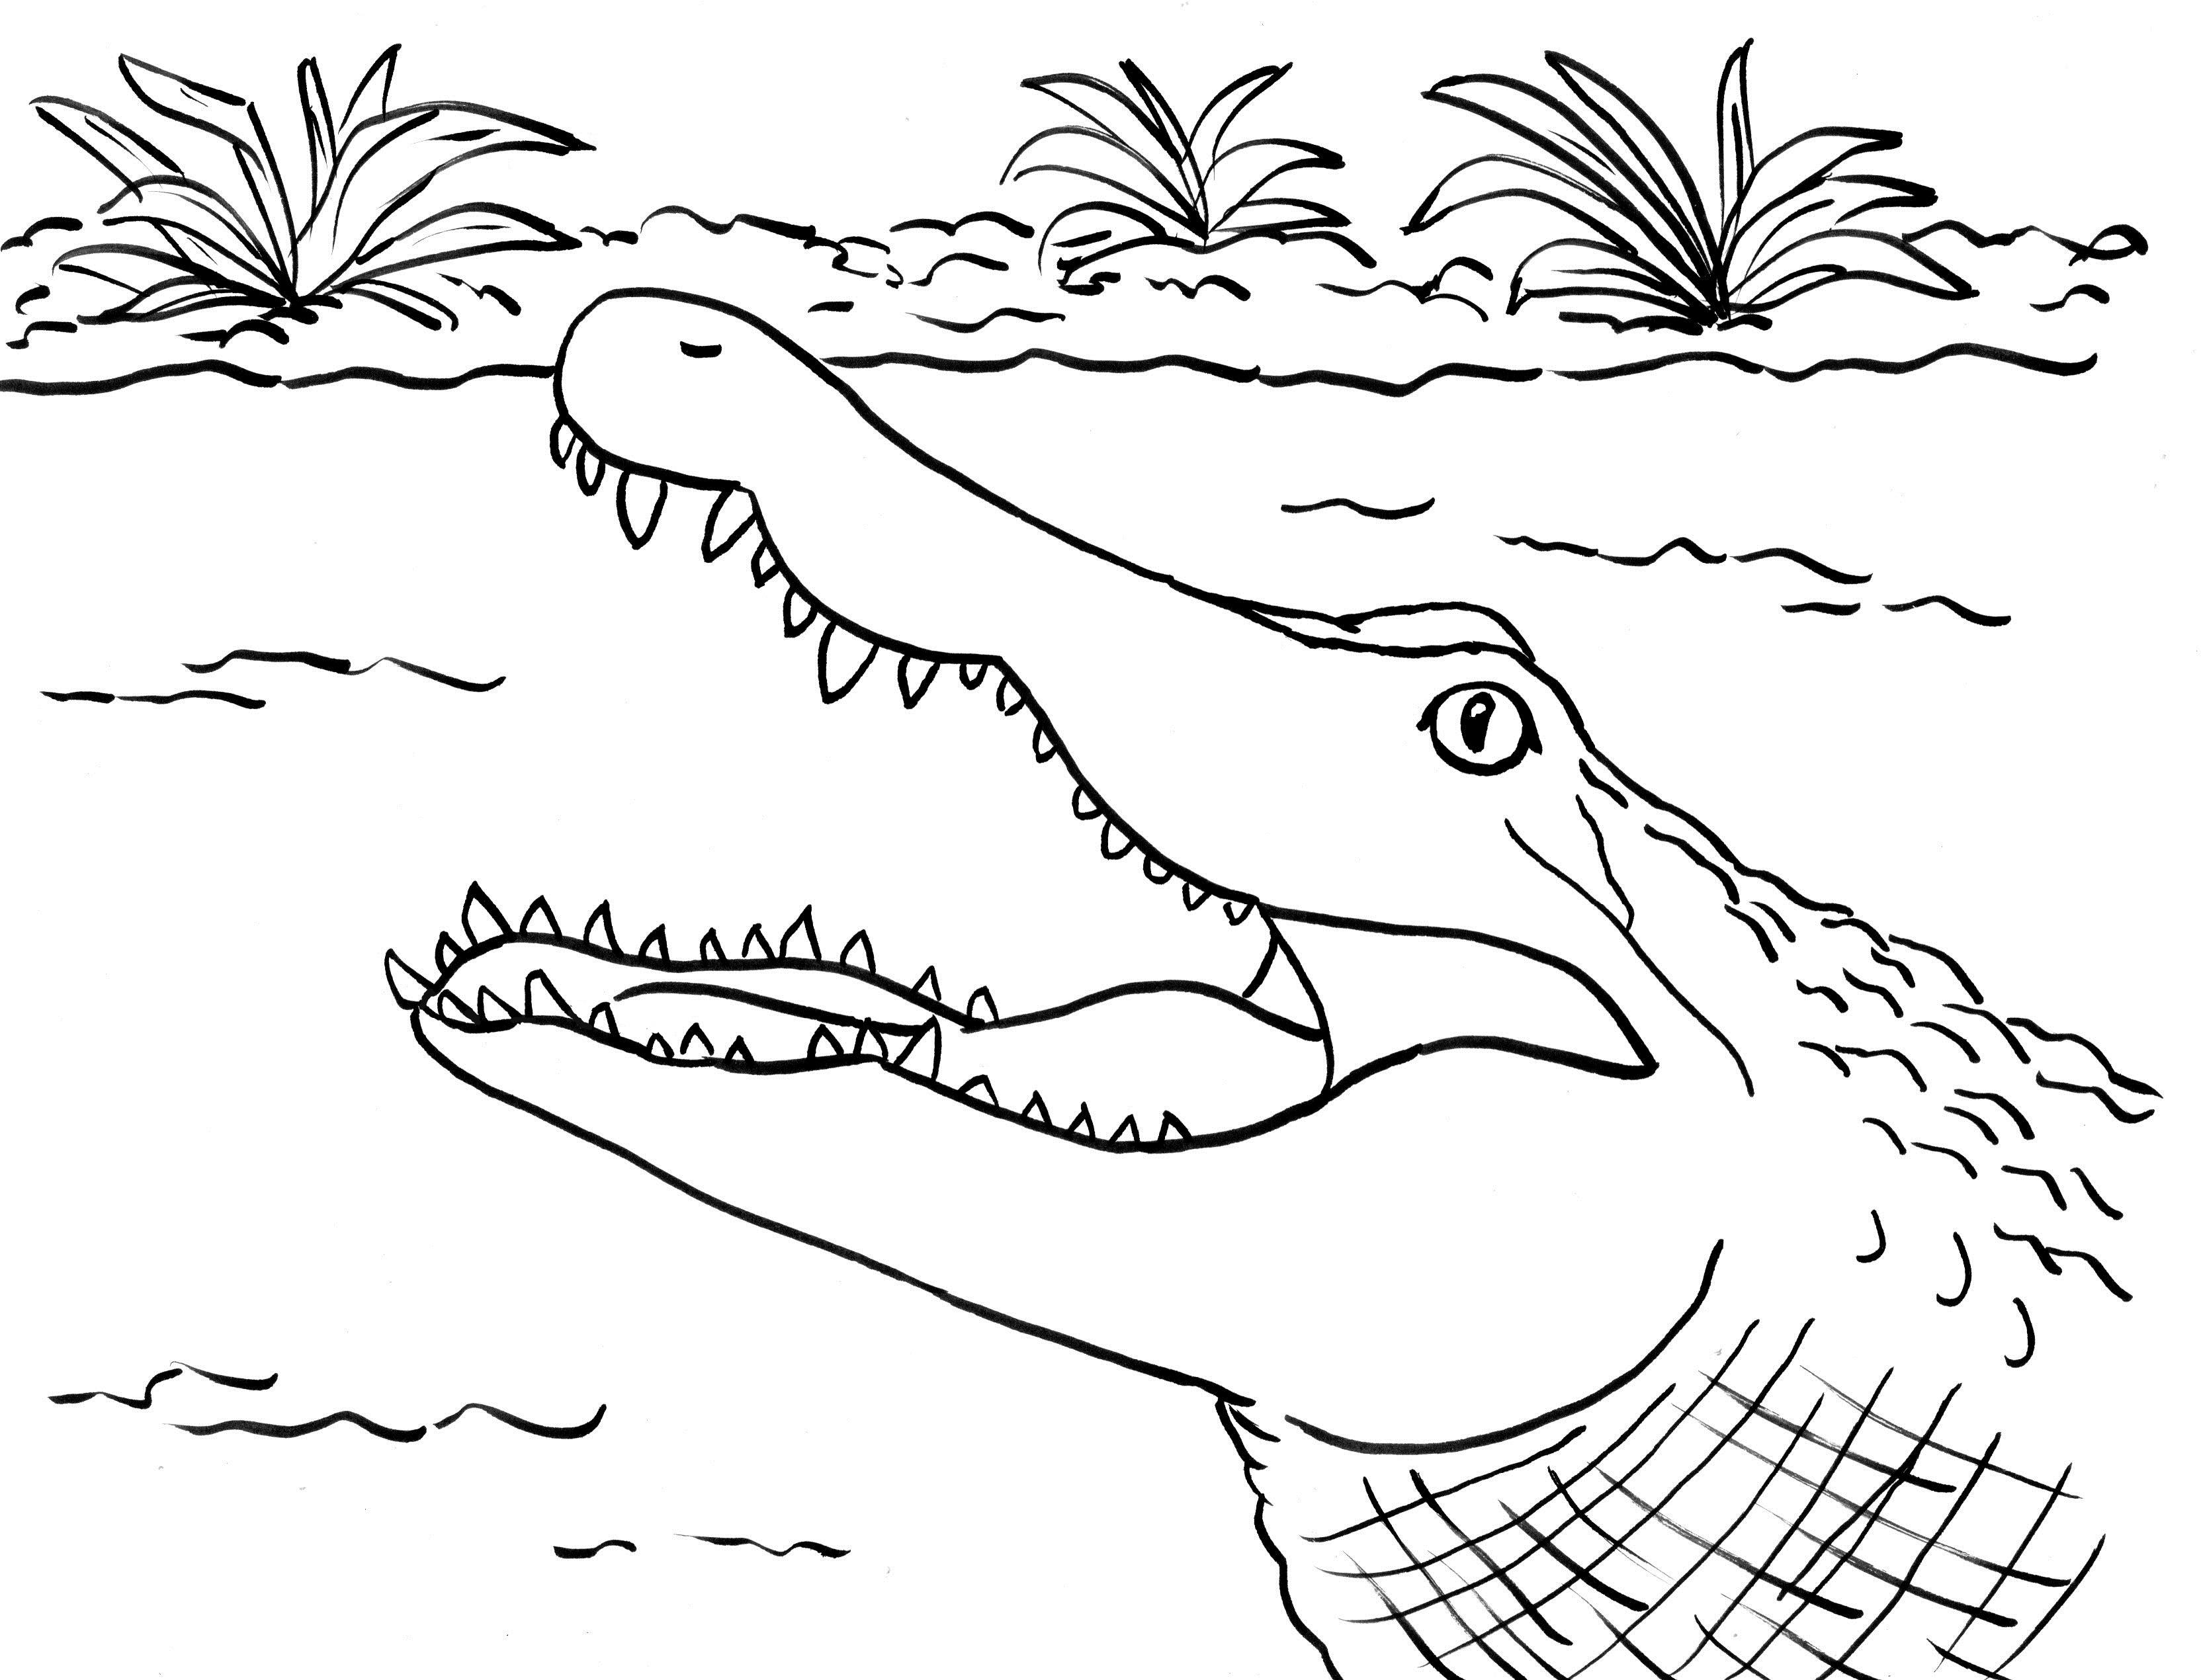 Coloring Page Alligator Alligator Coloring Page Art Starts For Kids